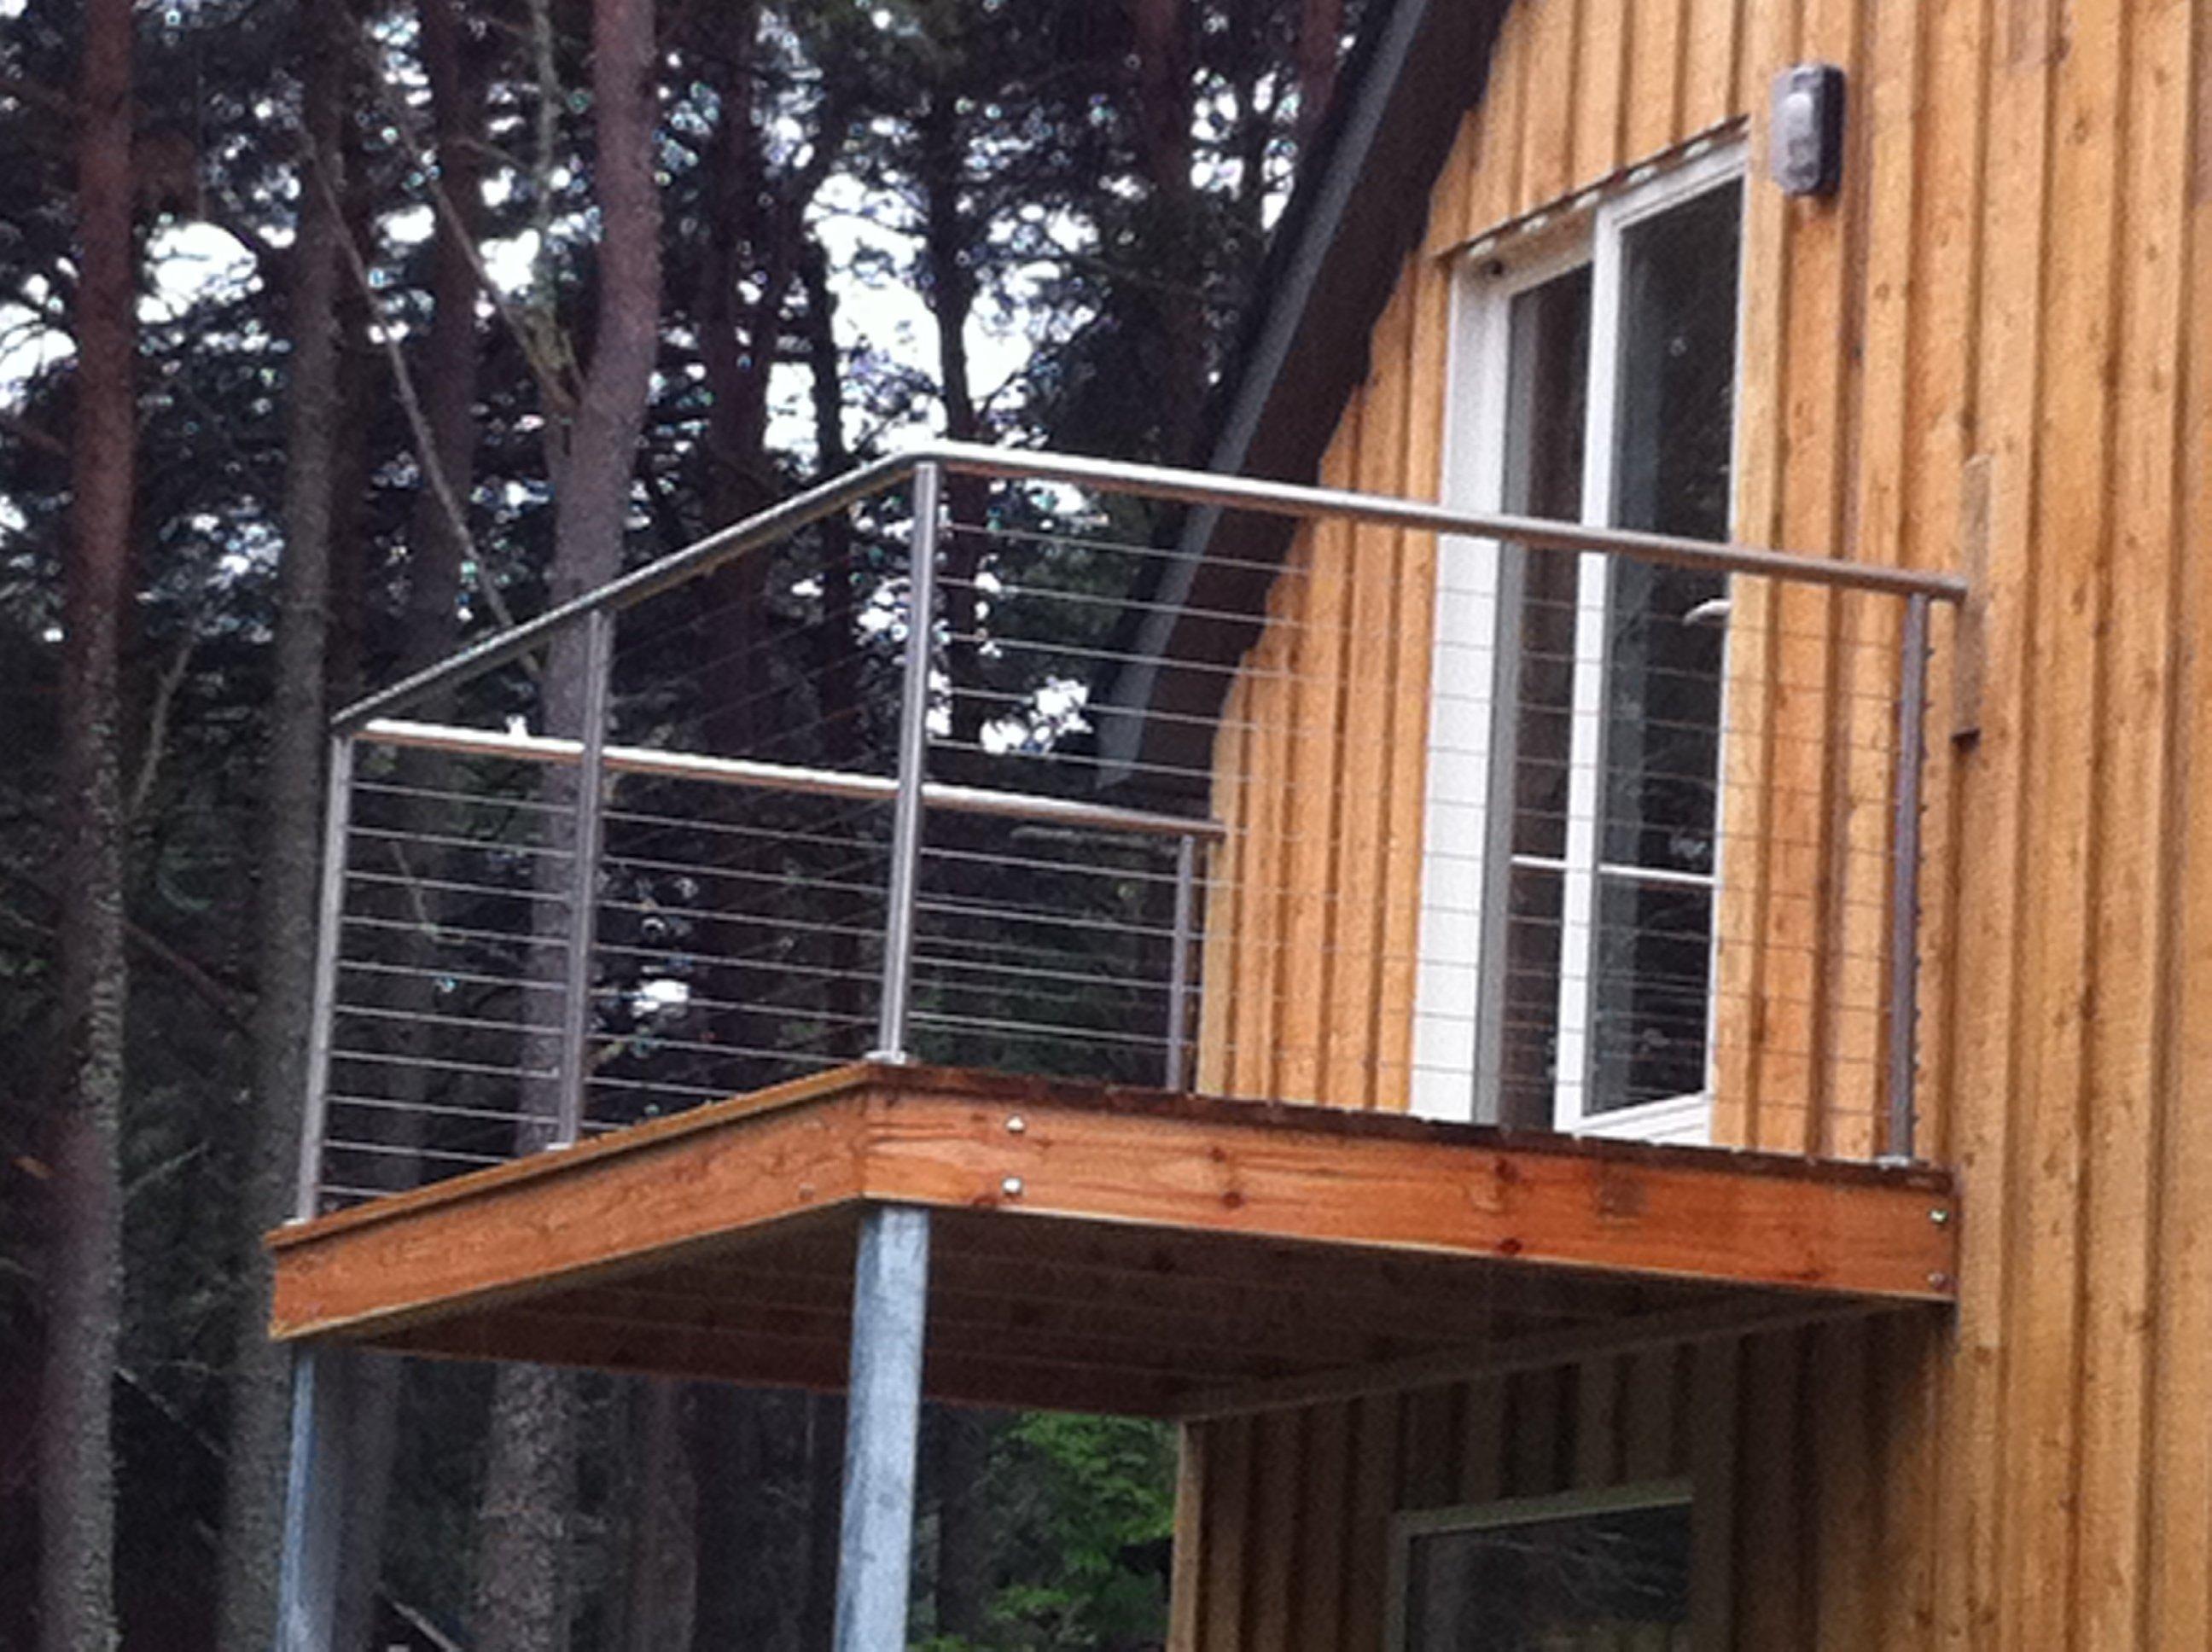 Metal railings